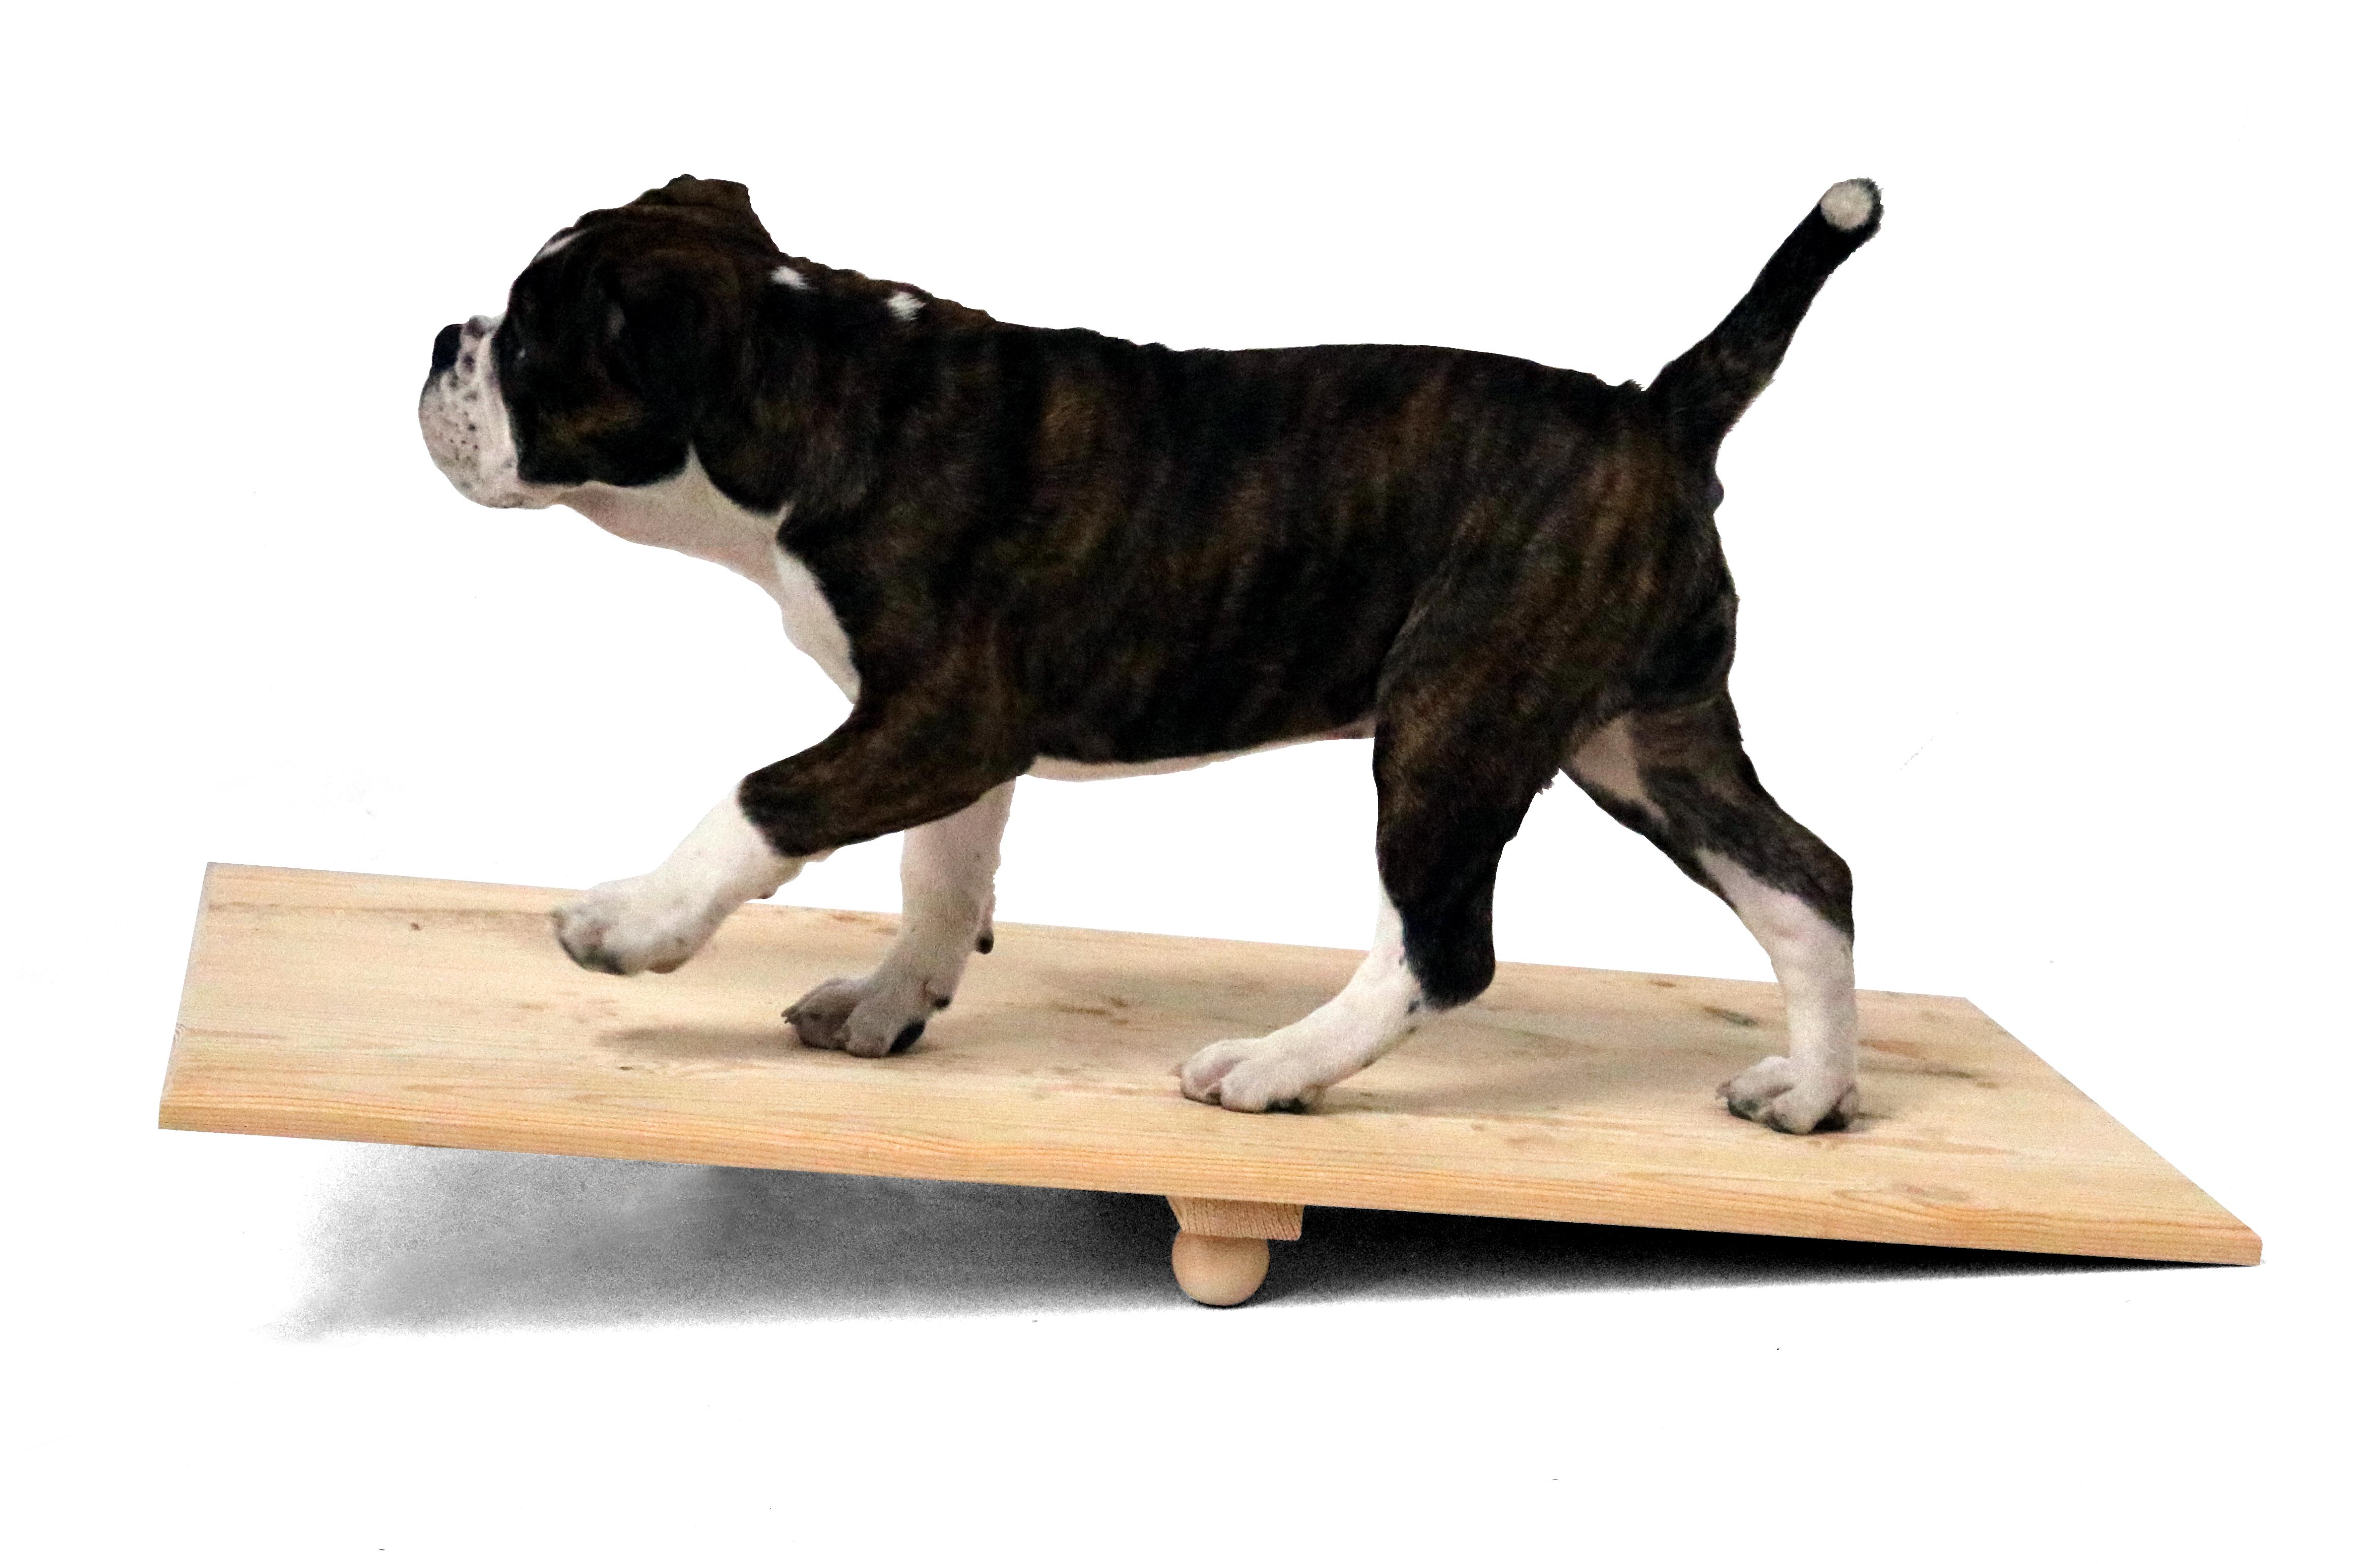 Welpen-Wippe, Activity Holz-Wippbrett für Hunde, naturbelassen